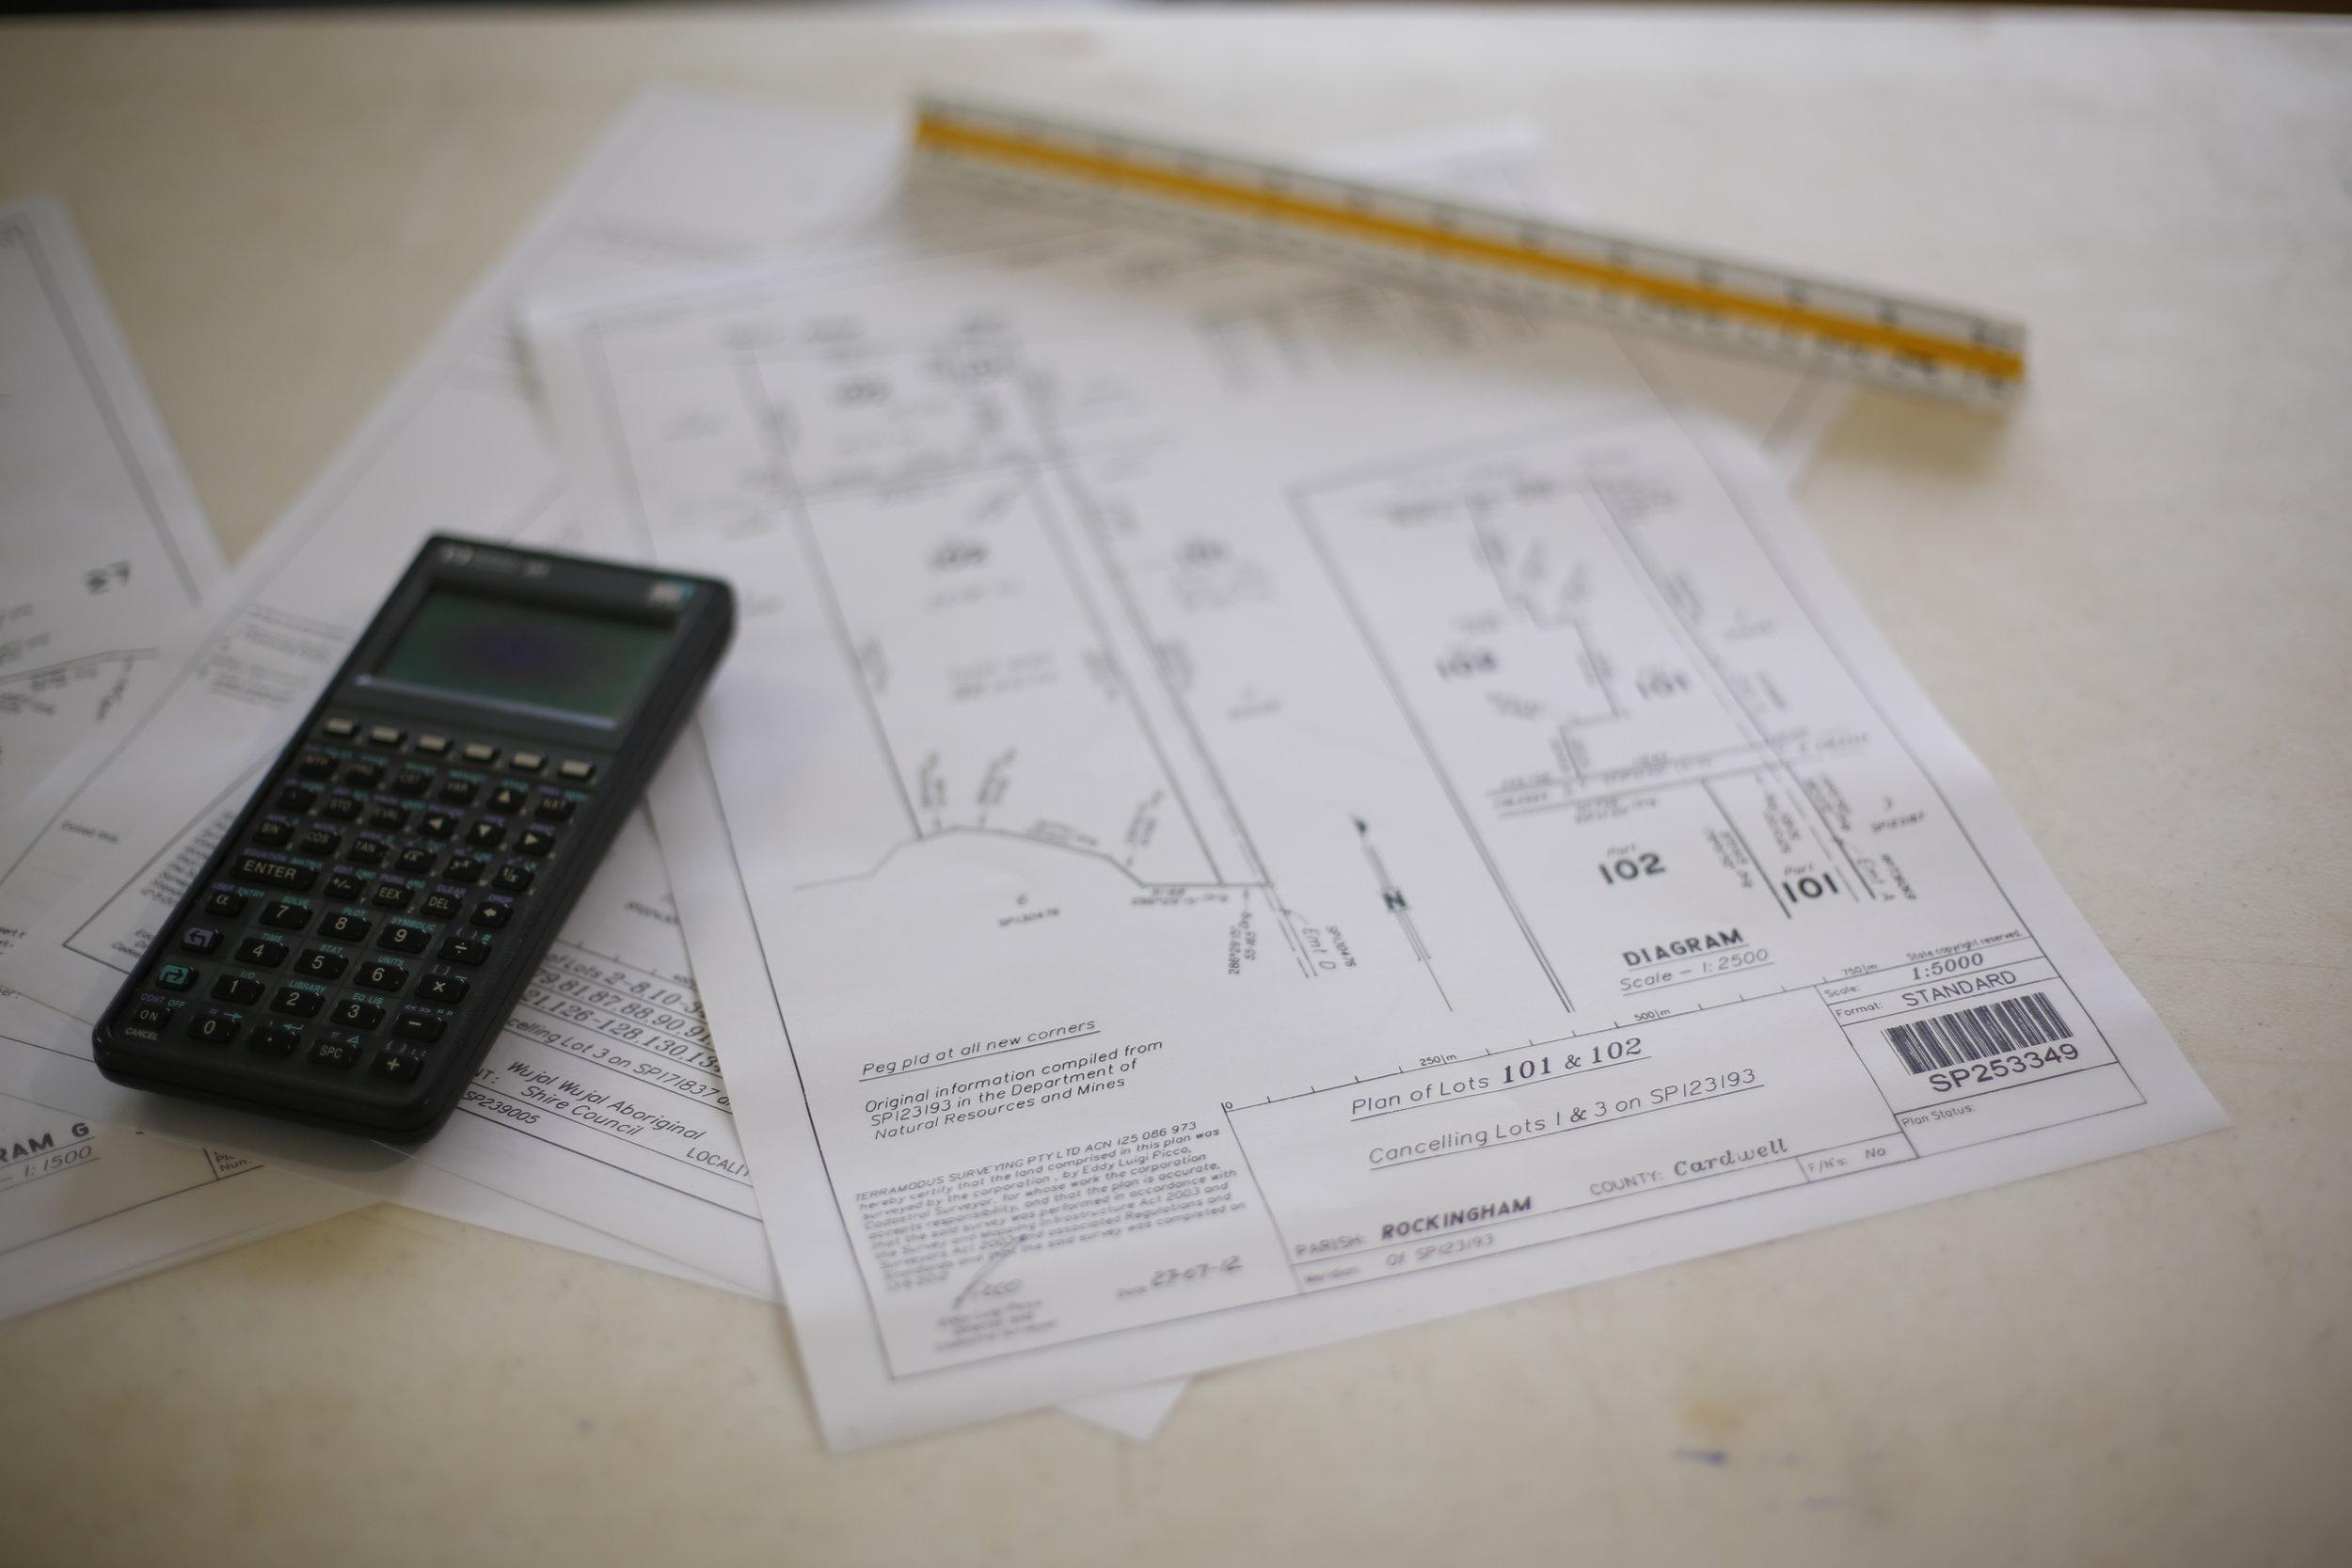 Cadastral Survey Plan